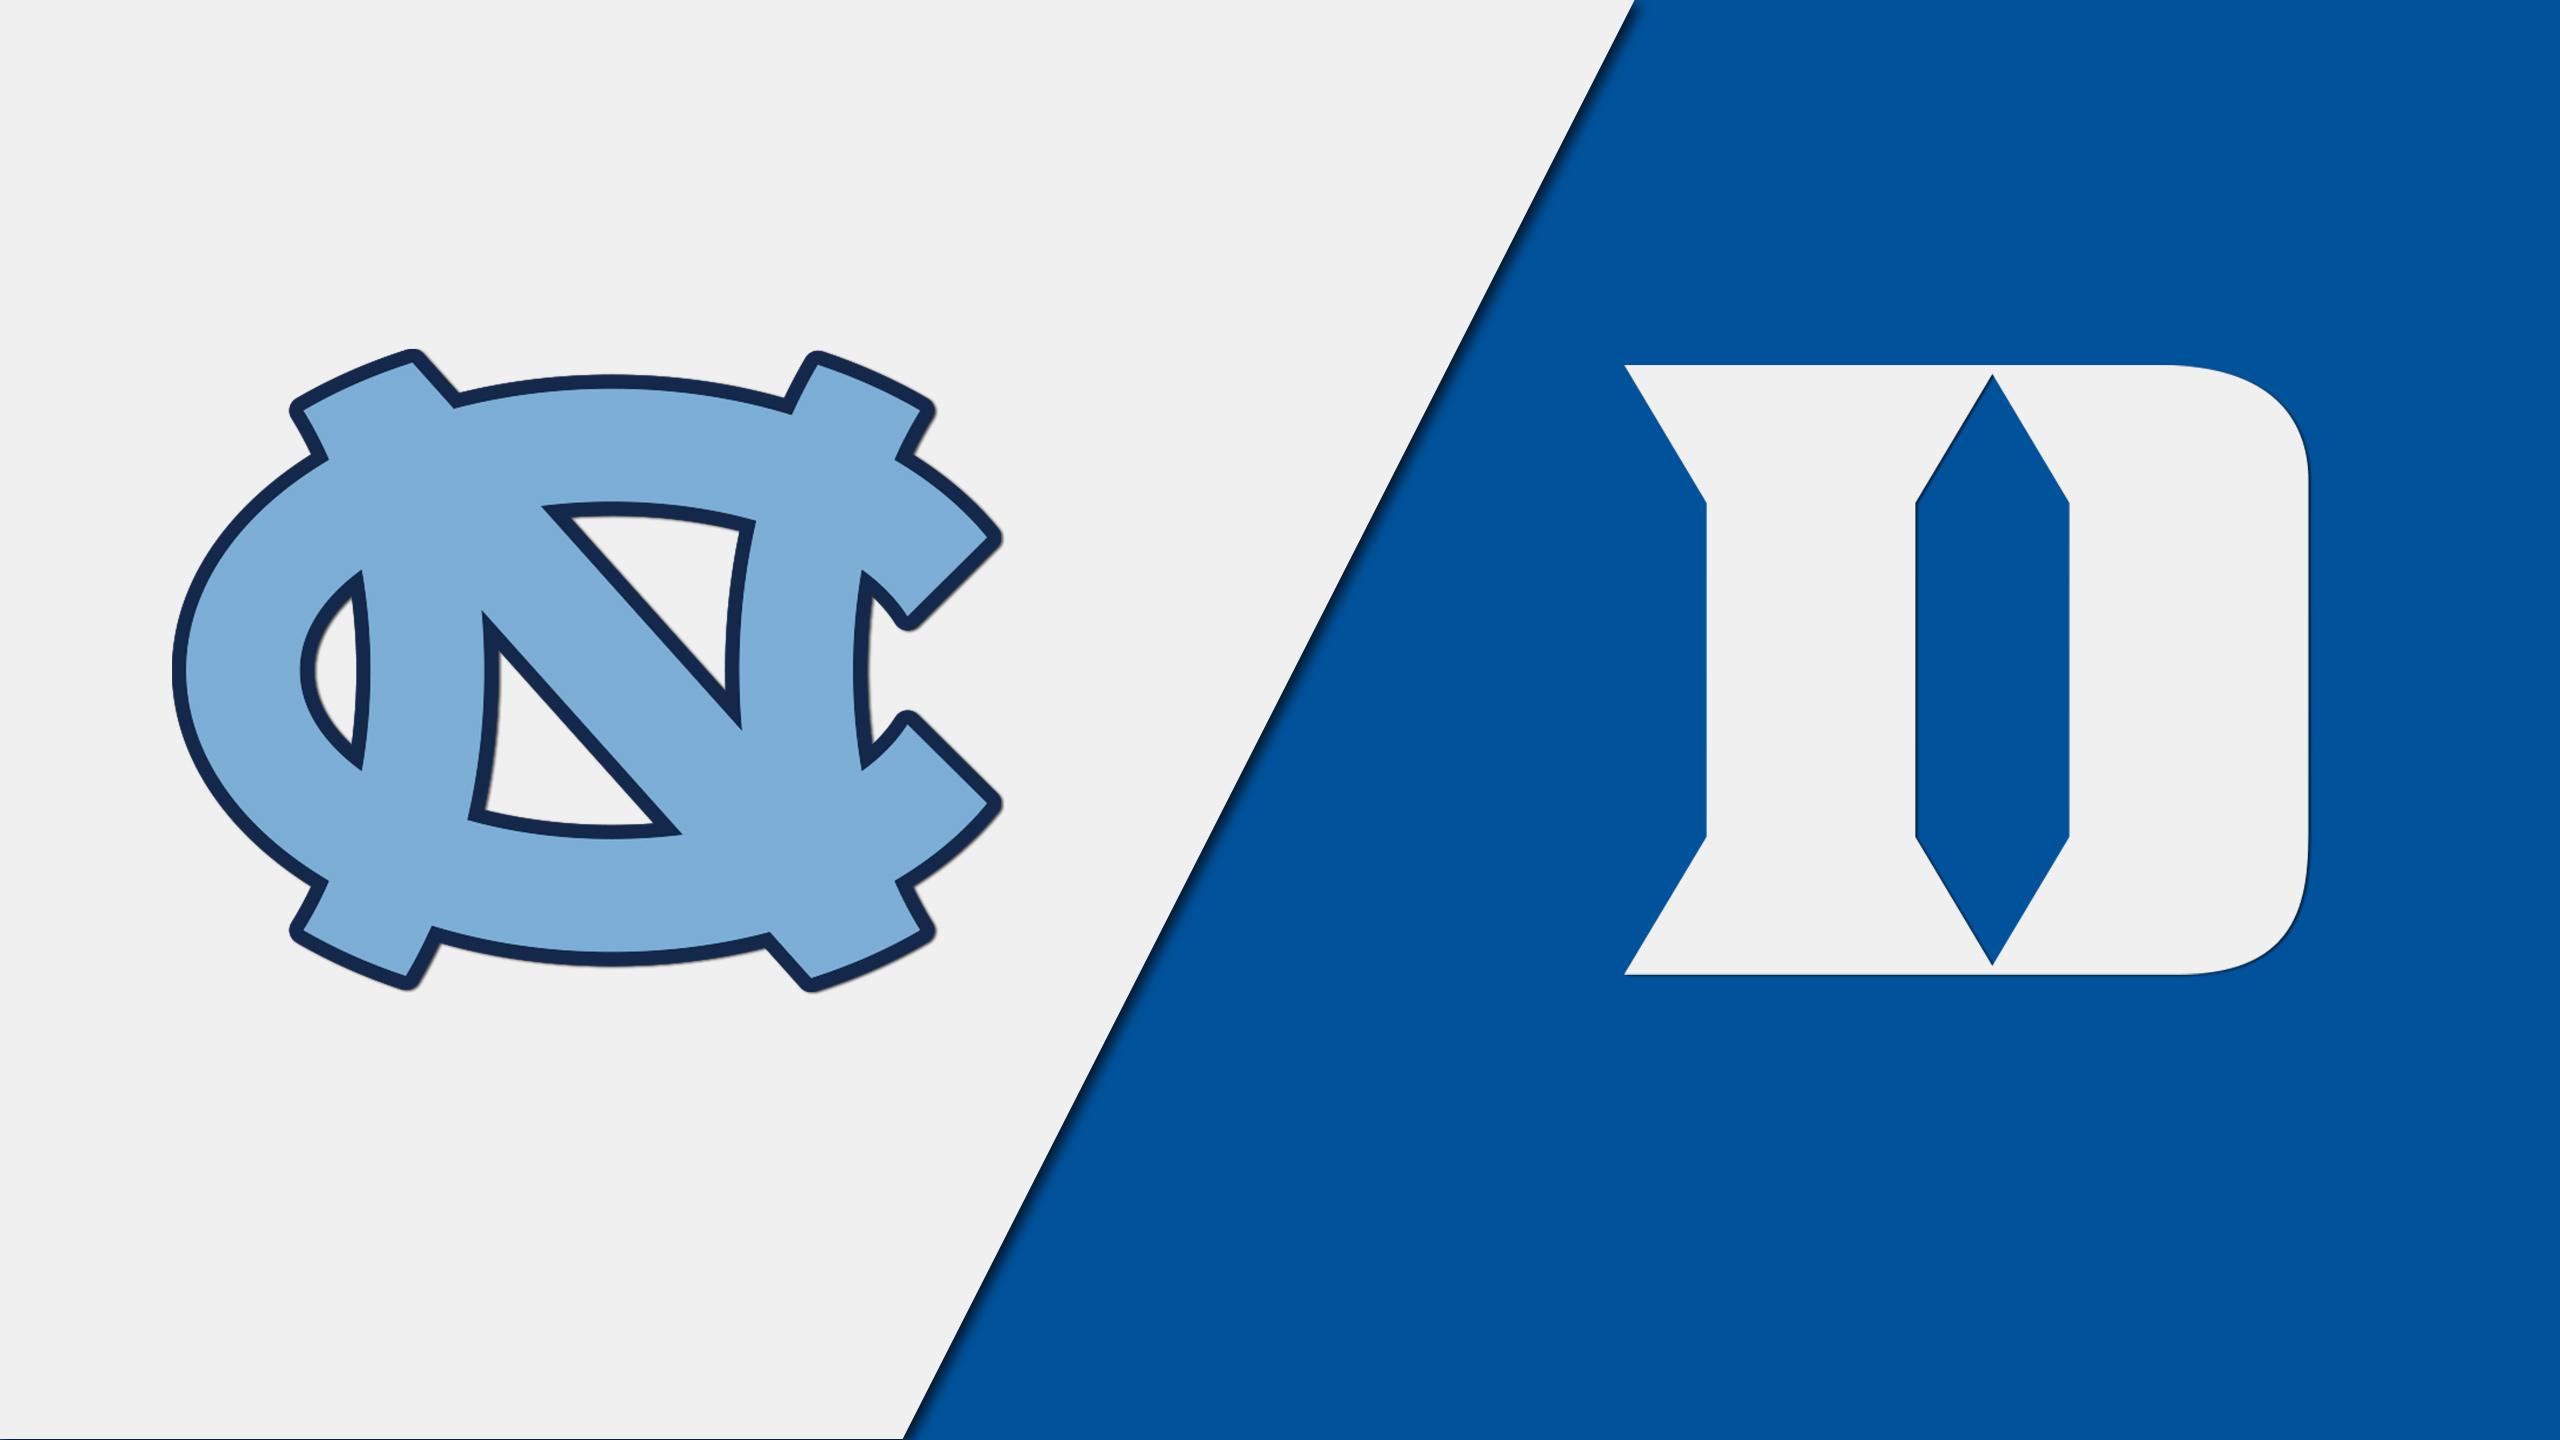 Layup Lines - #8 North Carolina vs. #1 Duke (M Basketball)